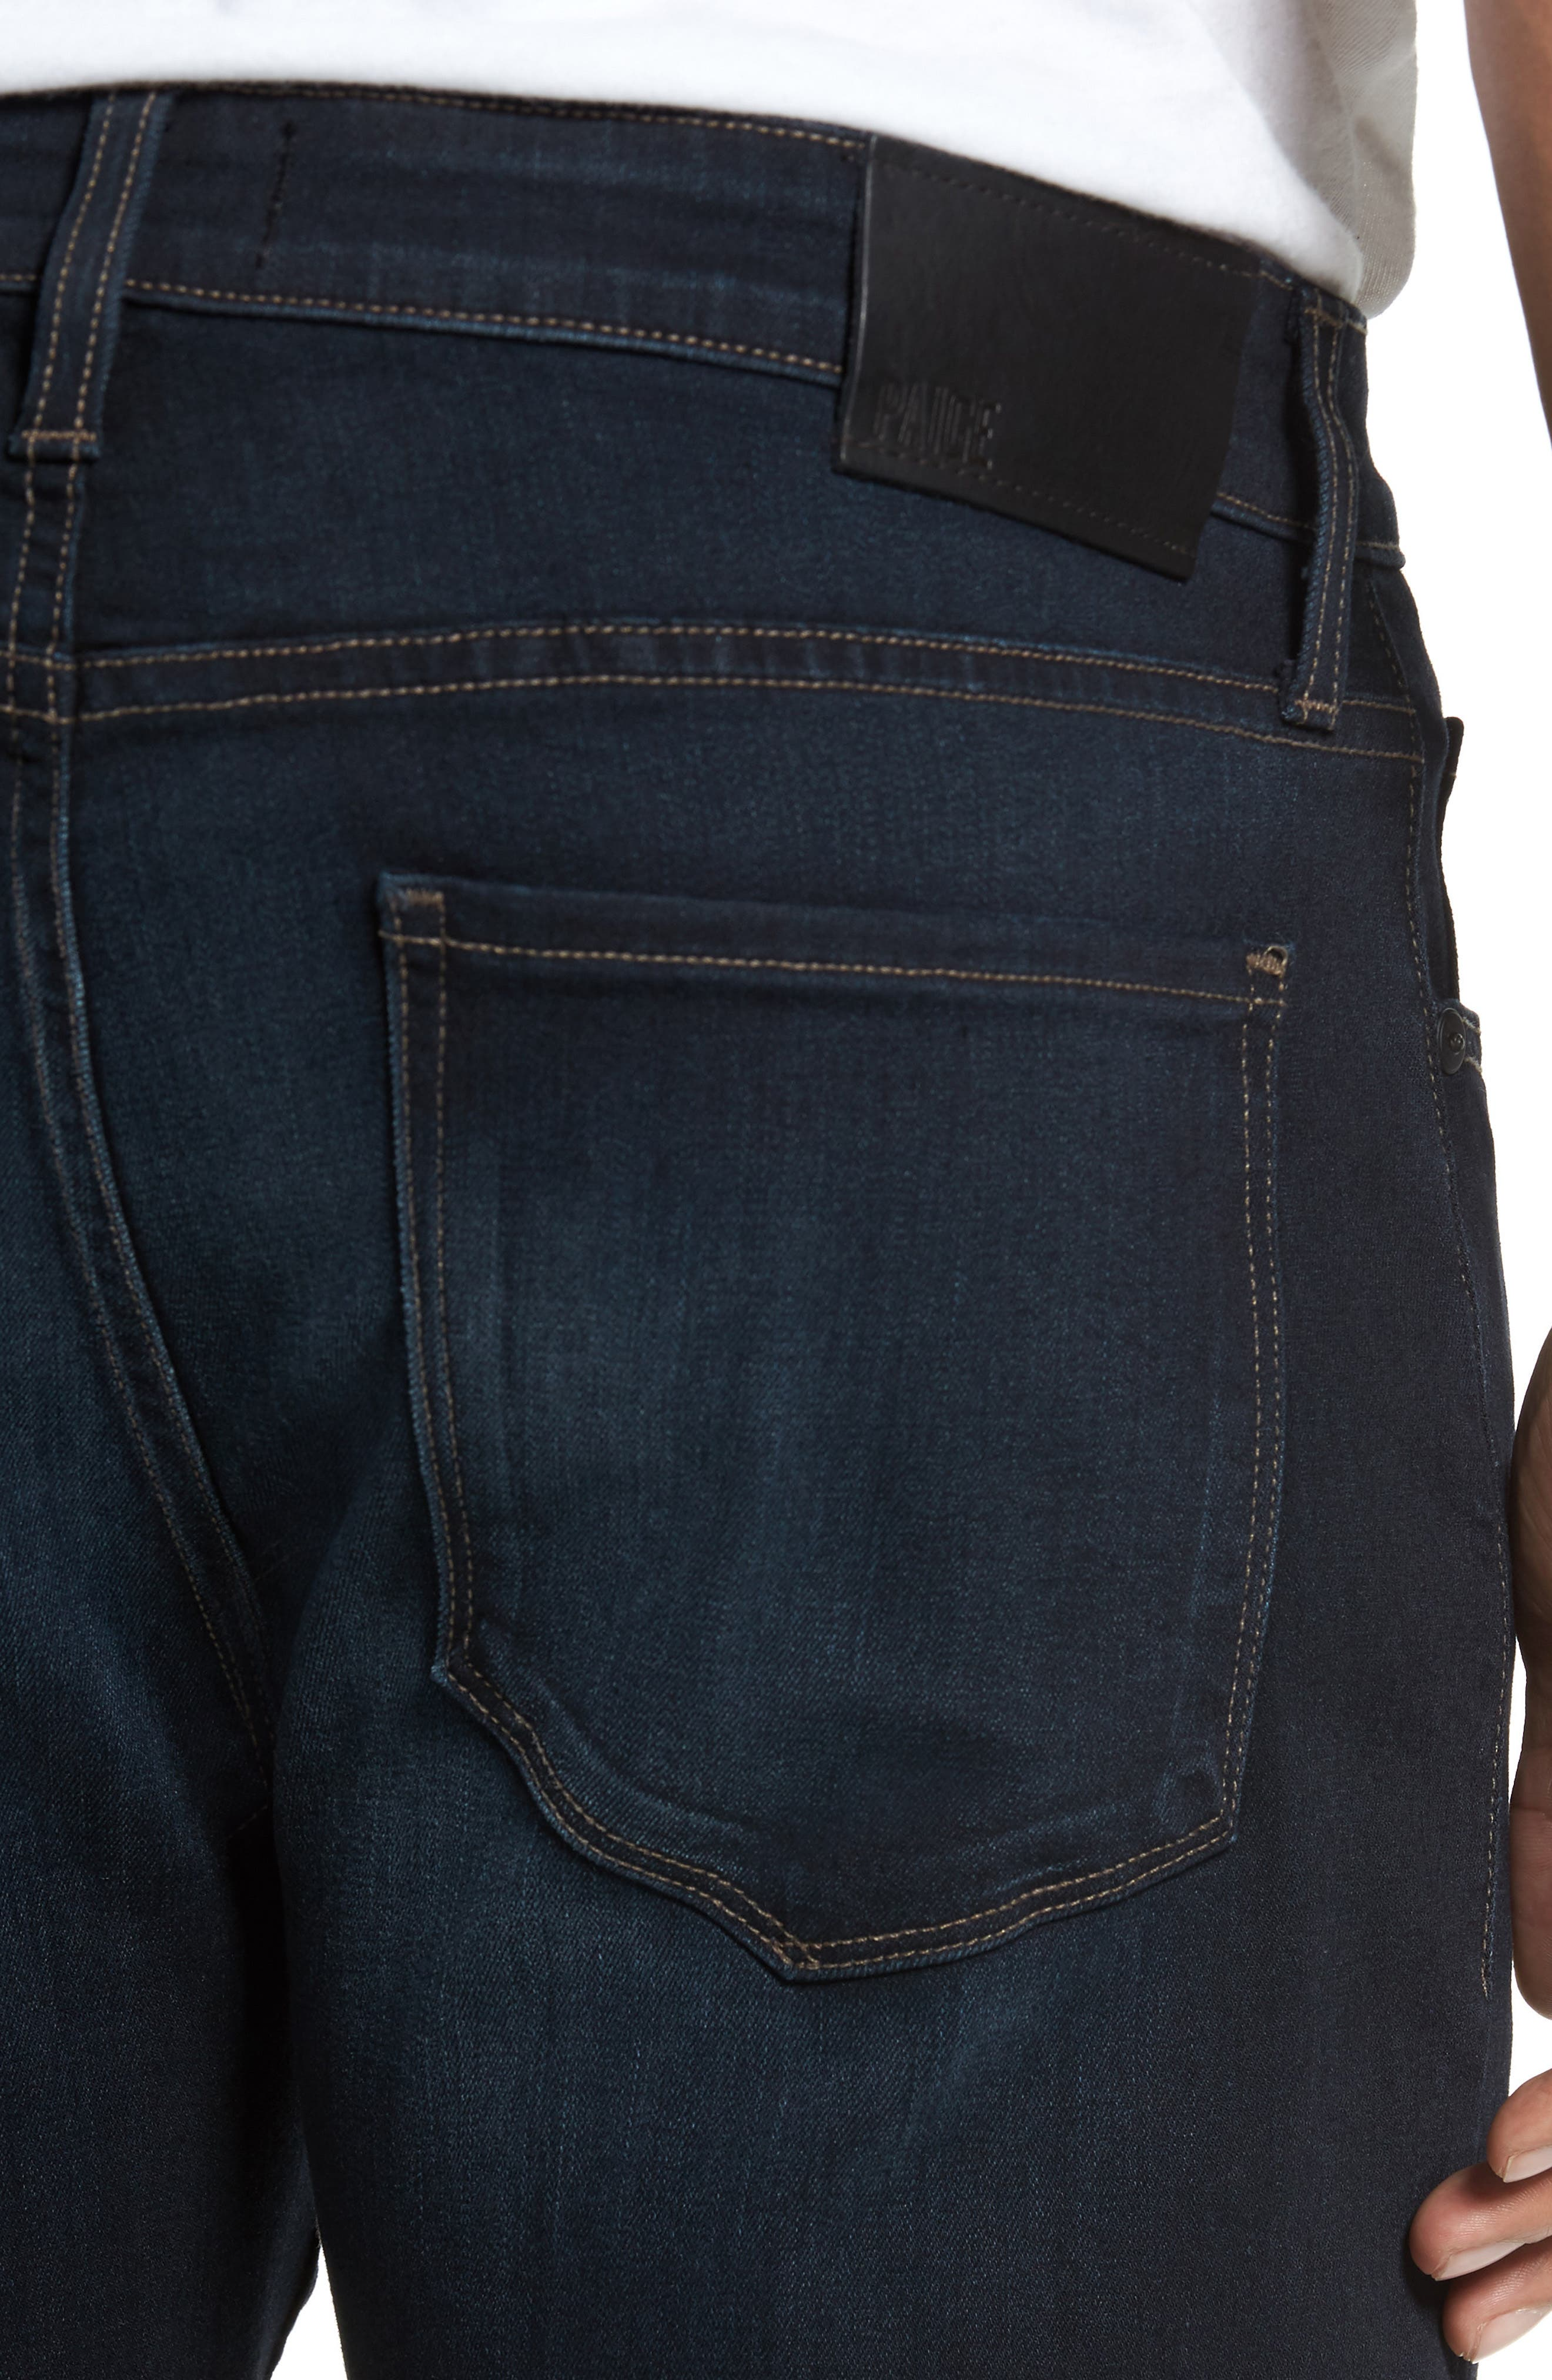 Transcend - Lennox Slim Fit Jeans,                             Alternate thumbnail 4, color,                             400